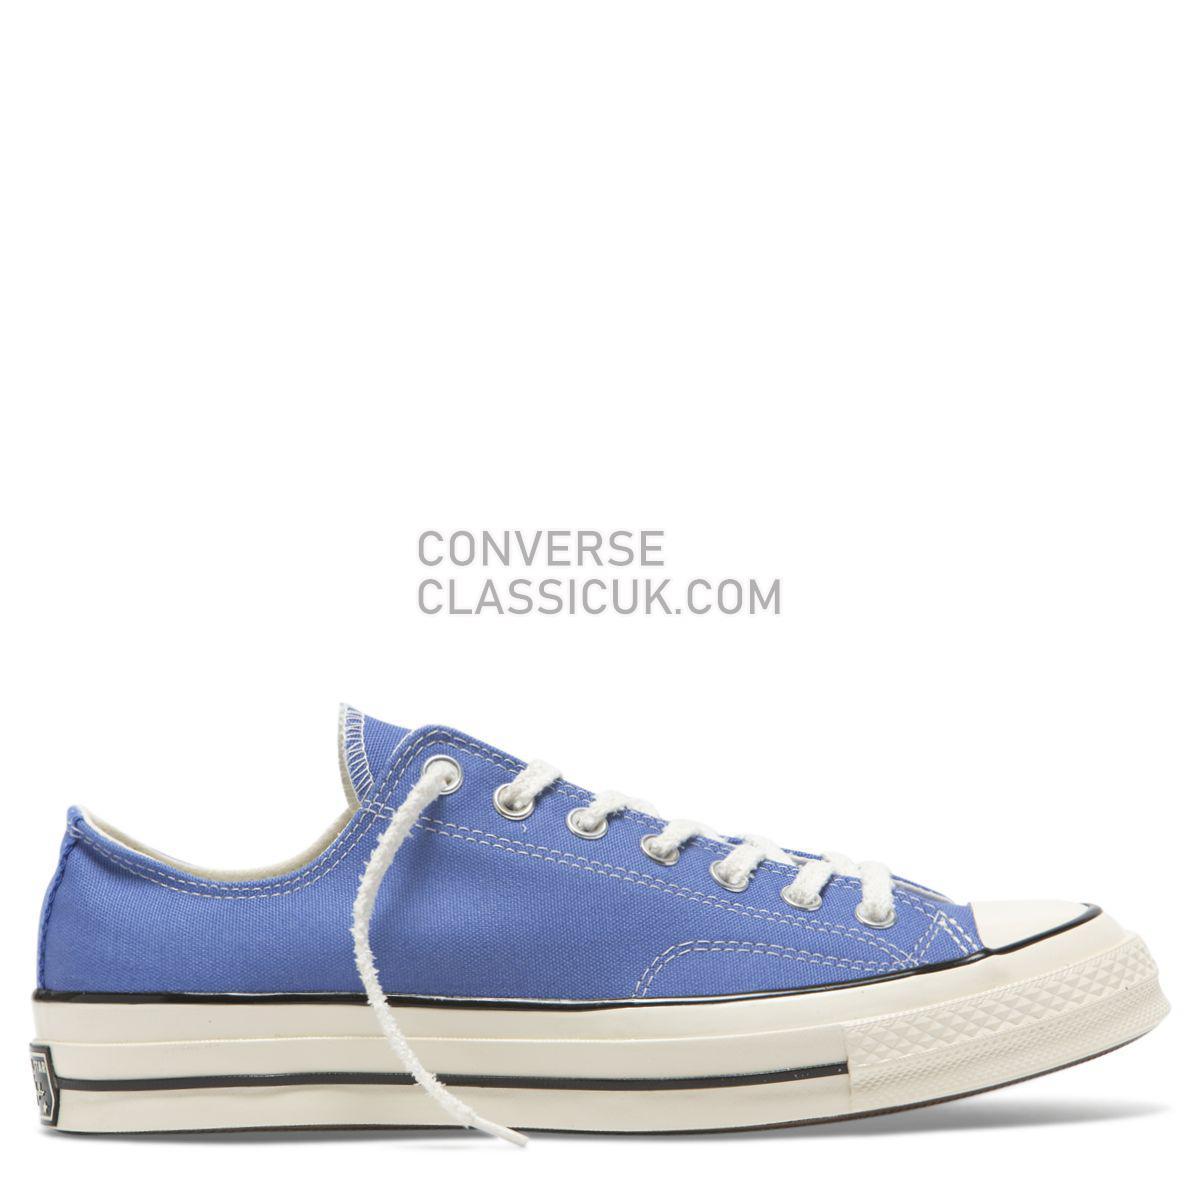 Converse Chuck Taylor All Star 70 Vintage Canvas Low Top Ozone Blue Mens Womens Unisex 164929 Ozone Blue/Egret/Black Shoes